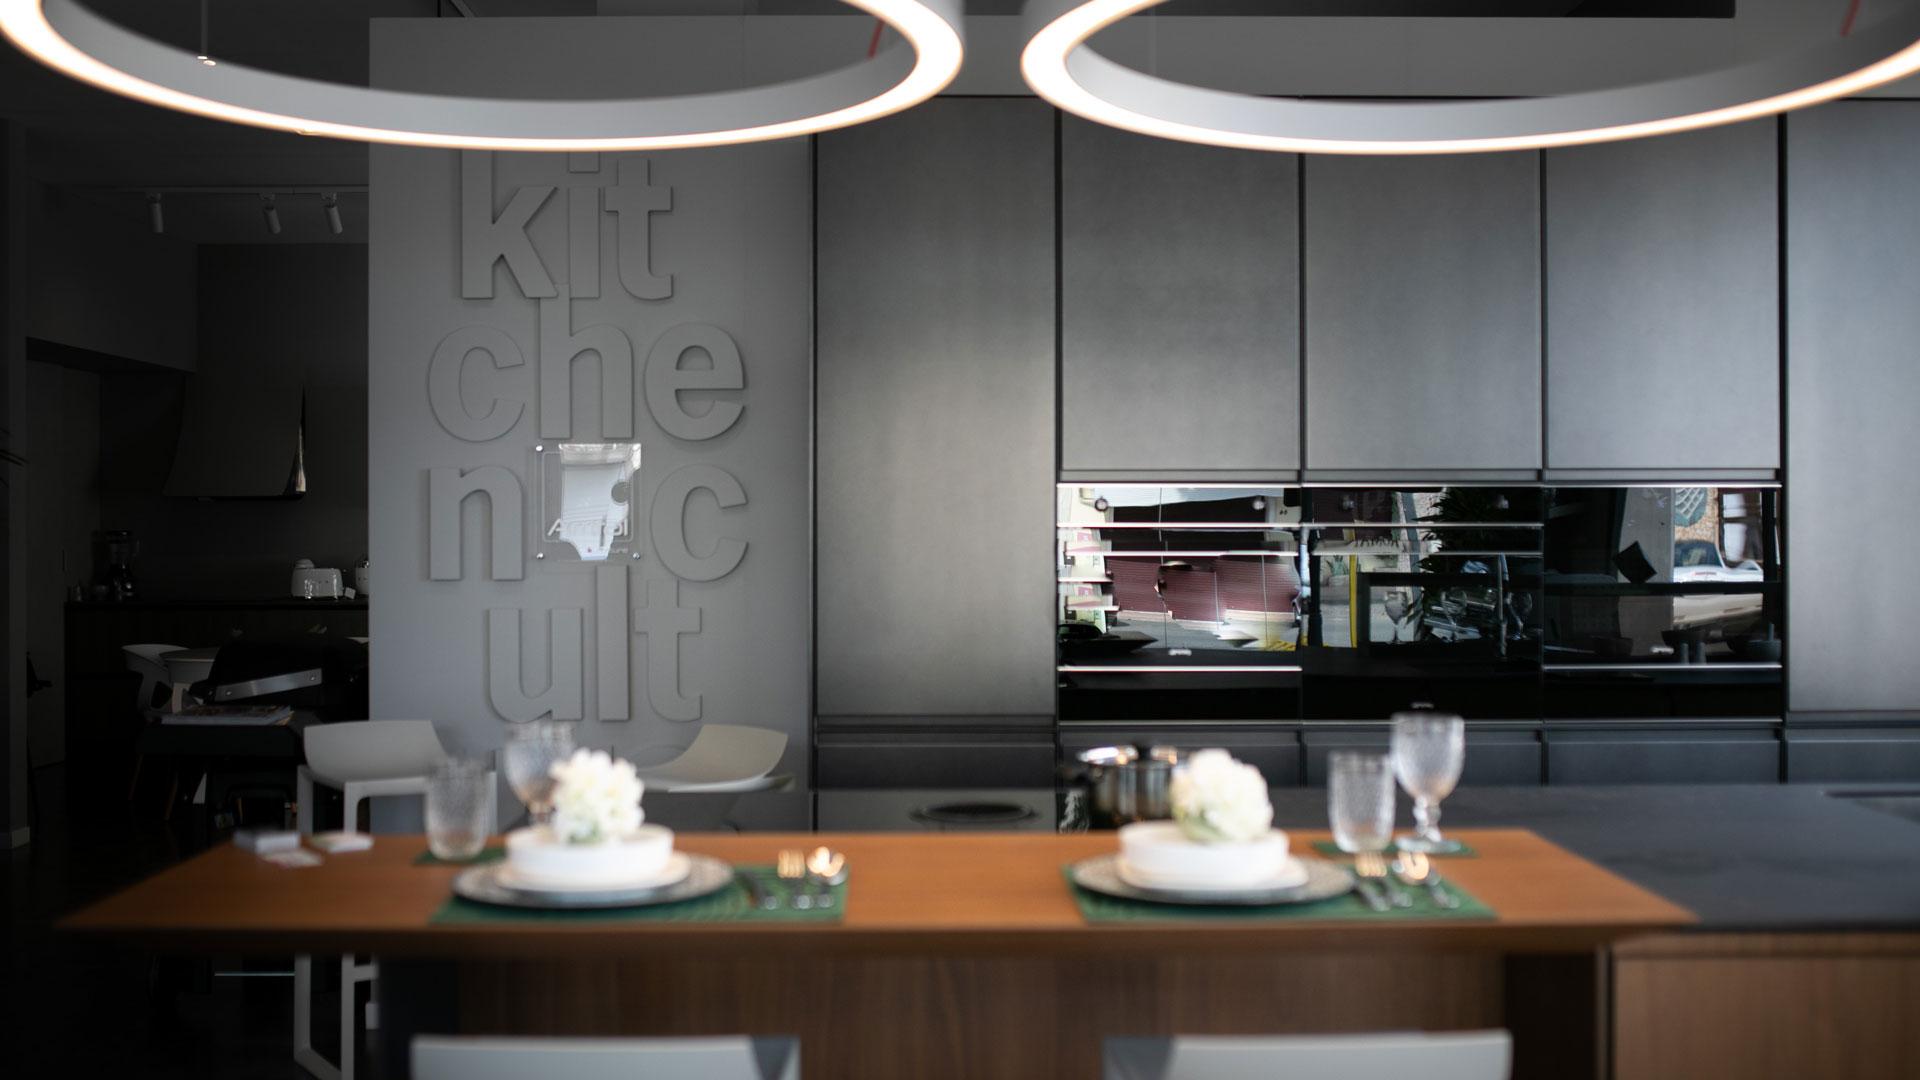 cocinas-kitchen-la-manga-cartagena-murcia